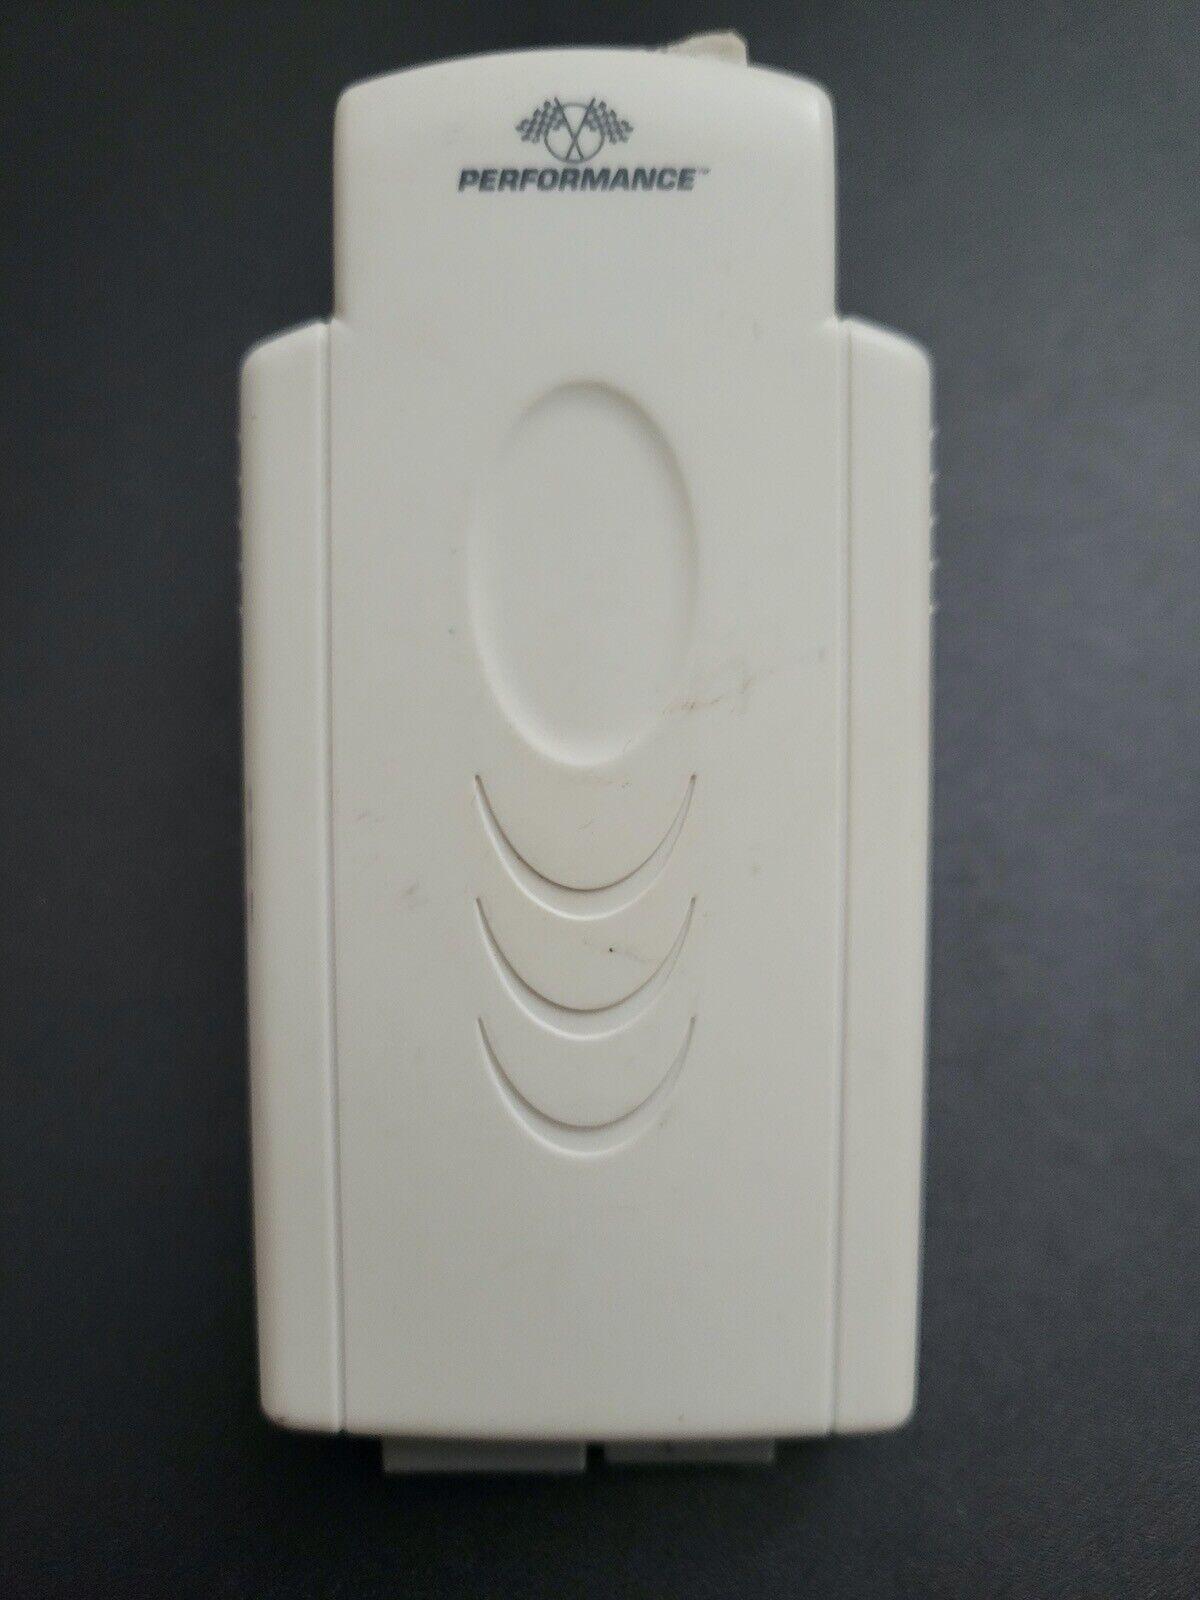 Performance White Sega Dreamcast Tremor Rumble PaK Pack Good Condition